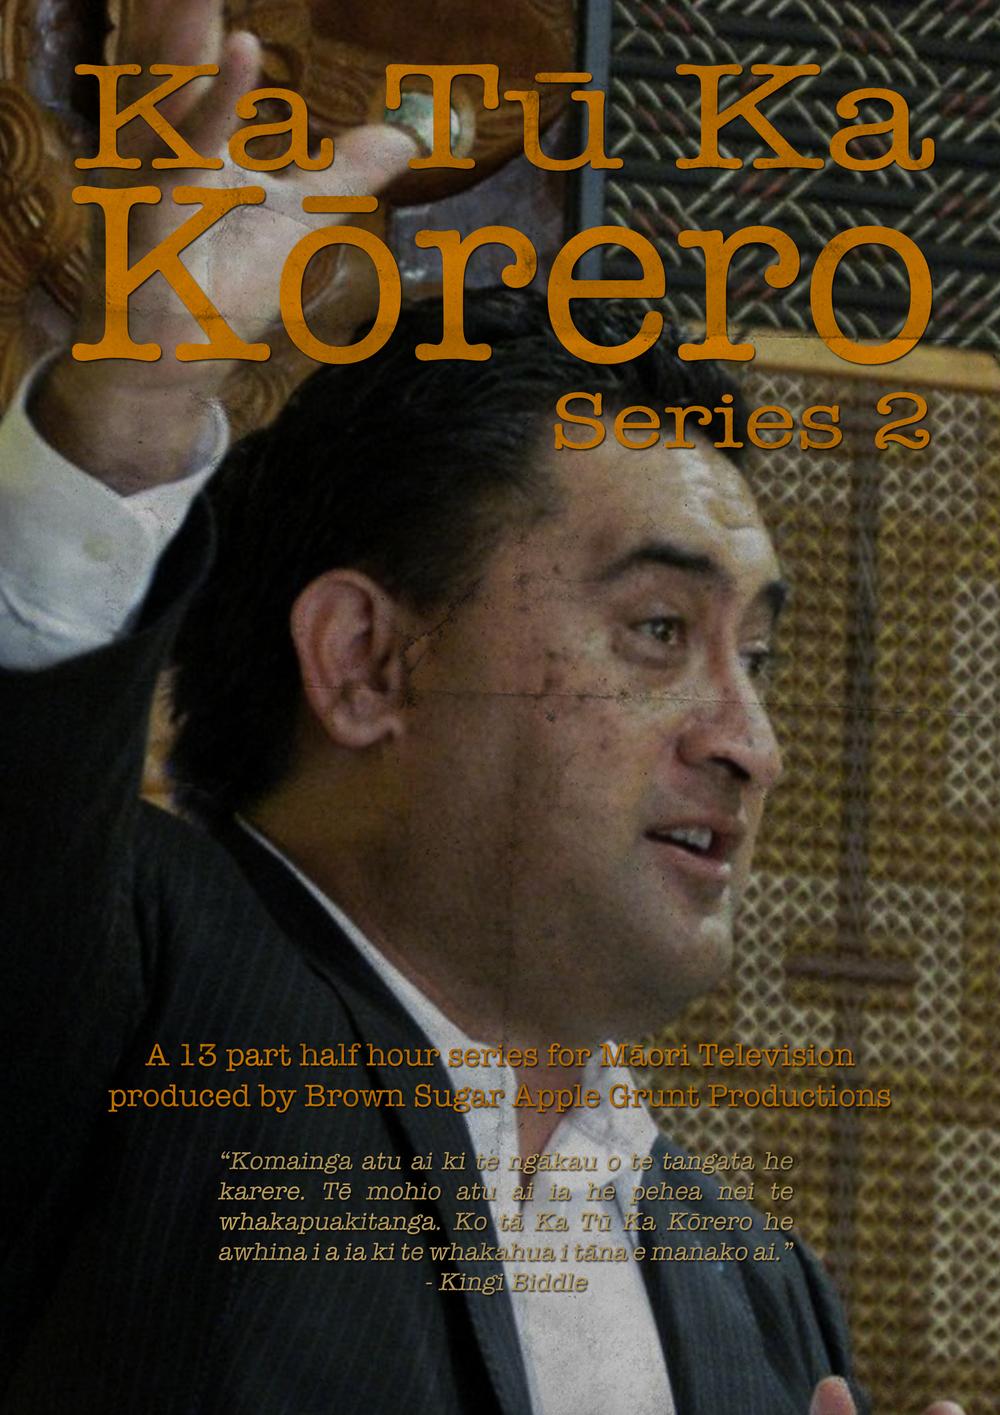 Ka Tū, Ka Kōrero 2. Kingi Biddle returns in this reboot of the series.